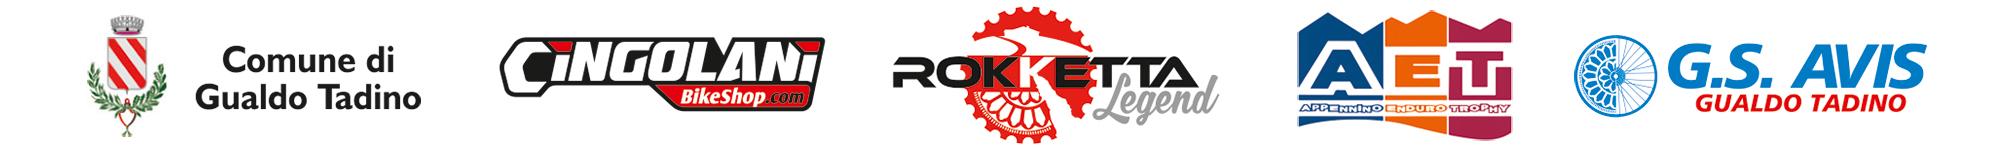 cingolani-rokketta-legend-loghi